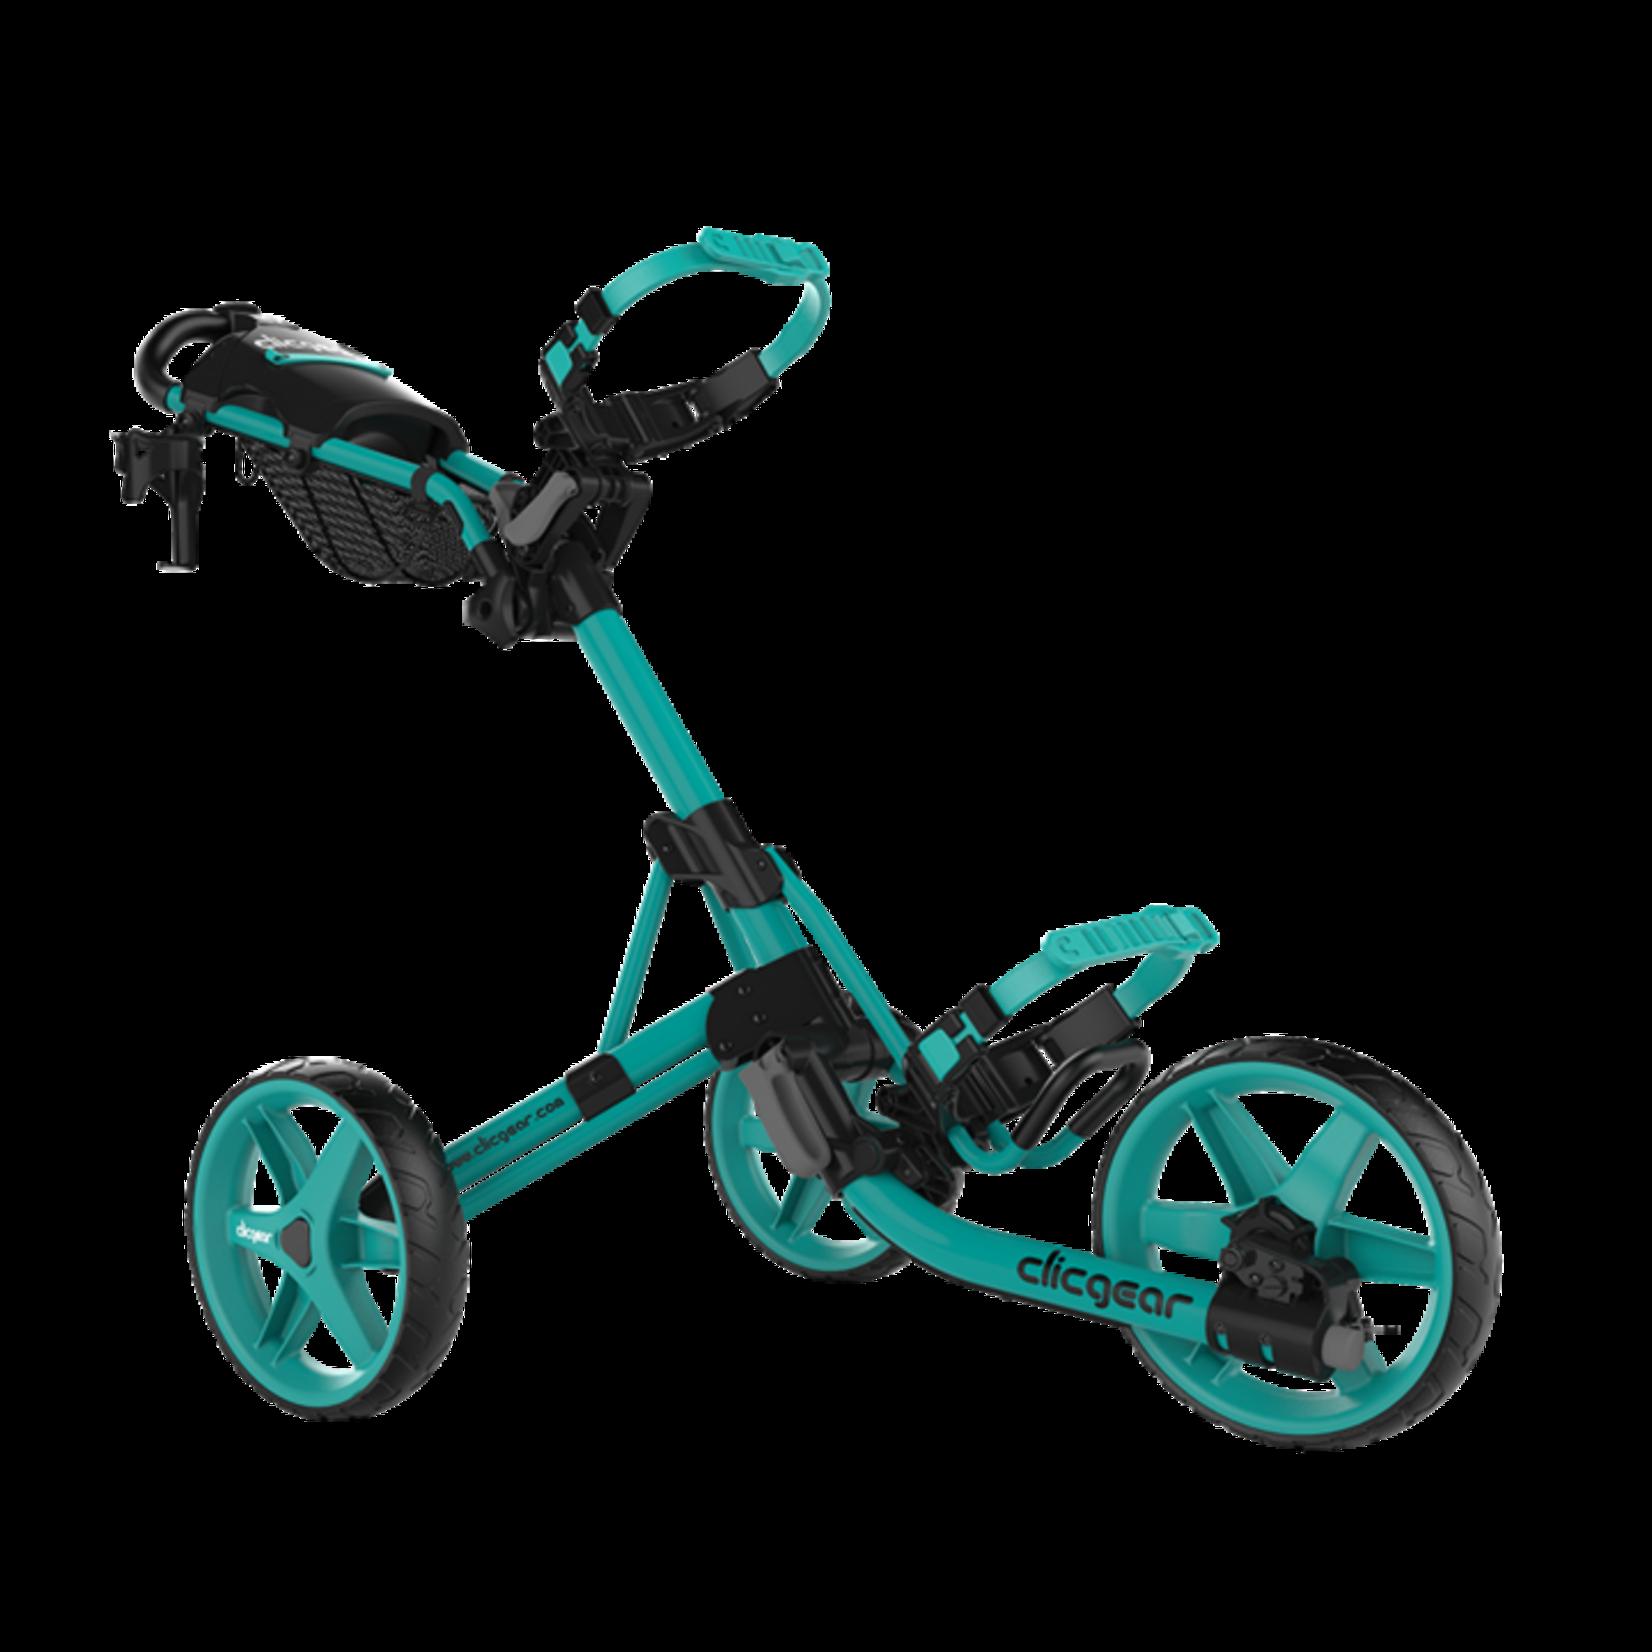 Clicgear Clicgear M 4.0 Push Cart